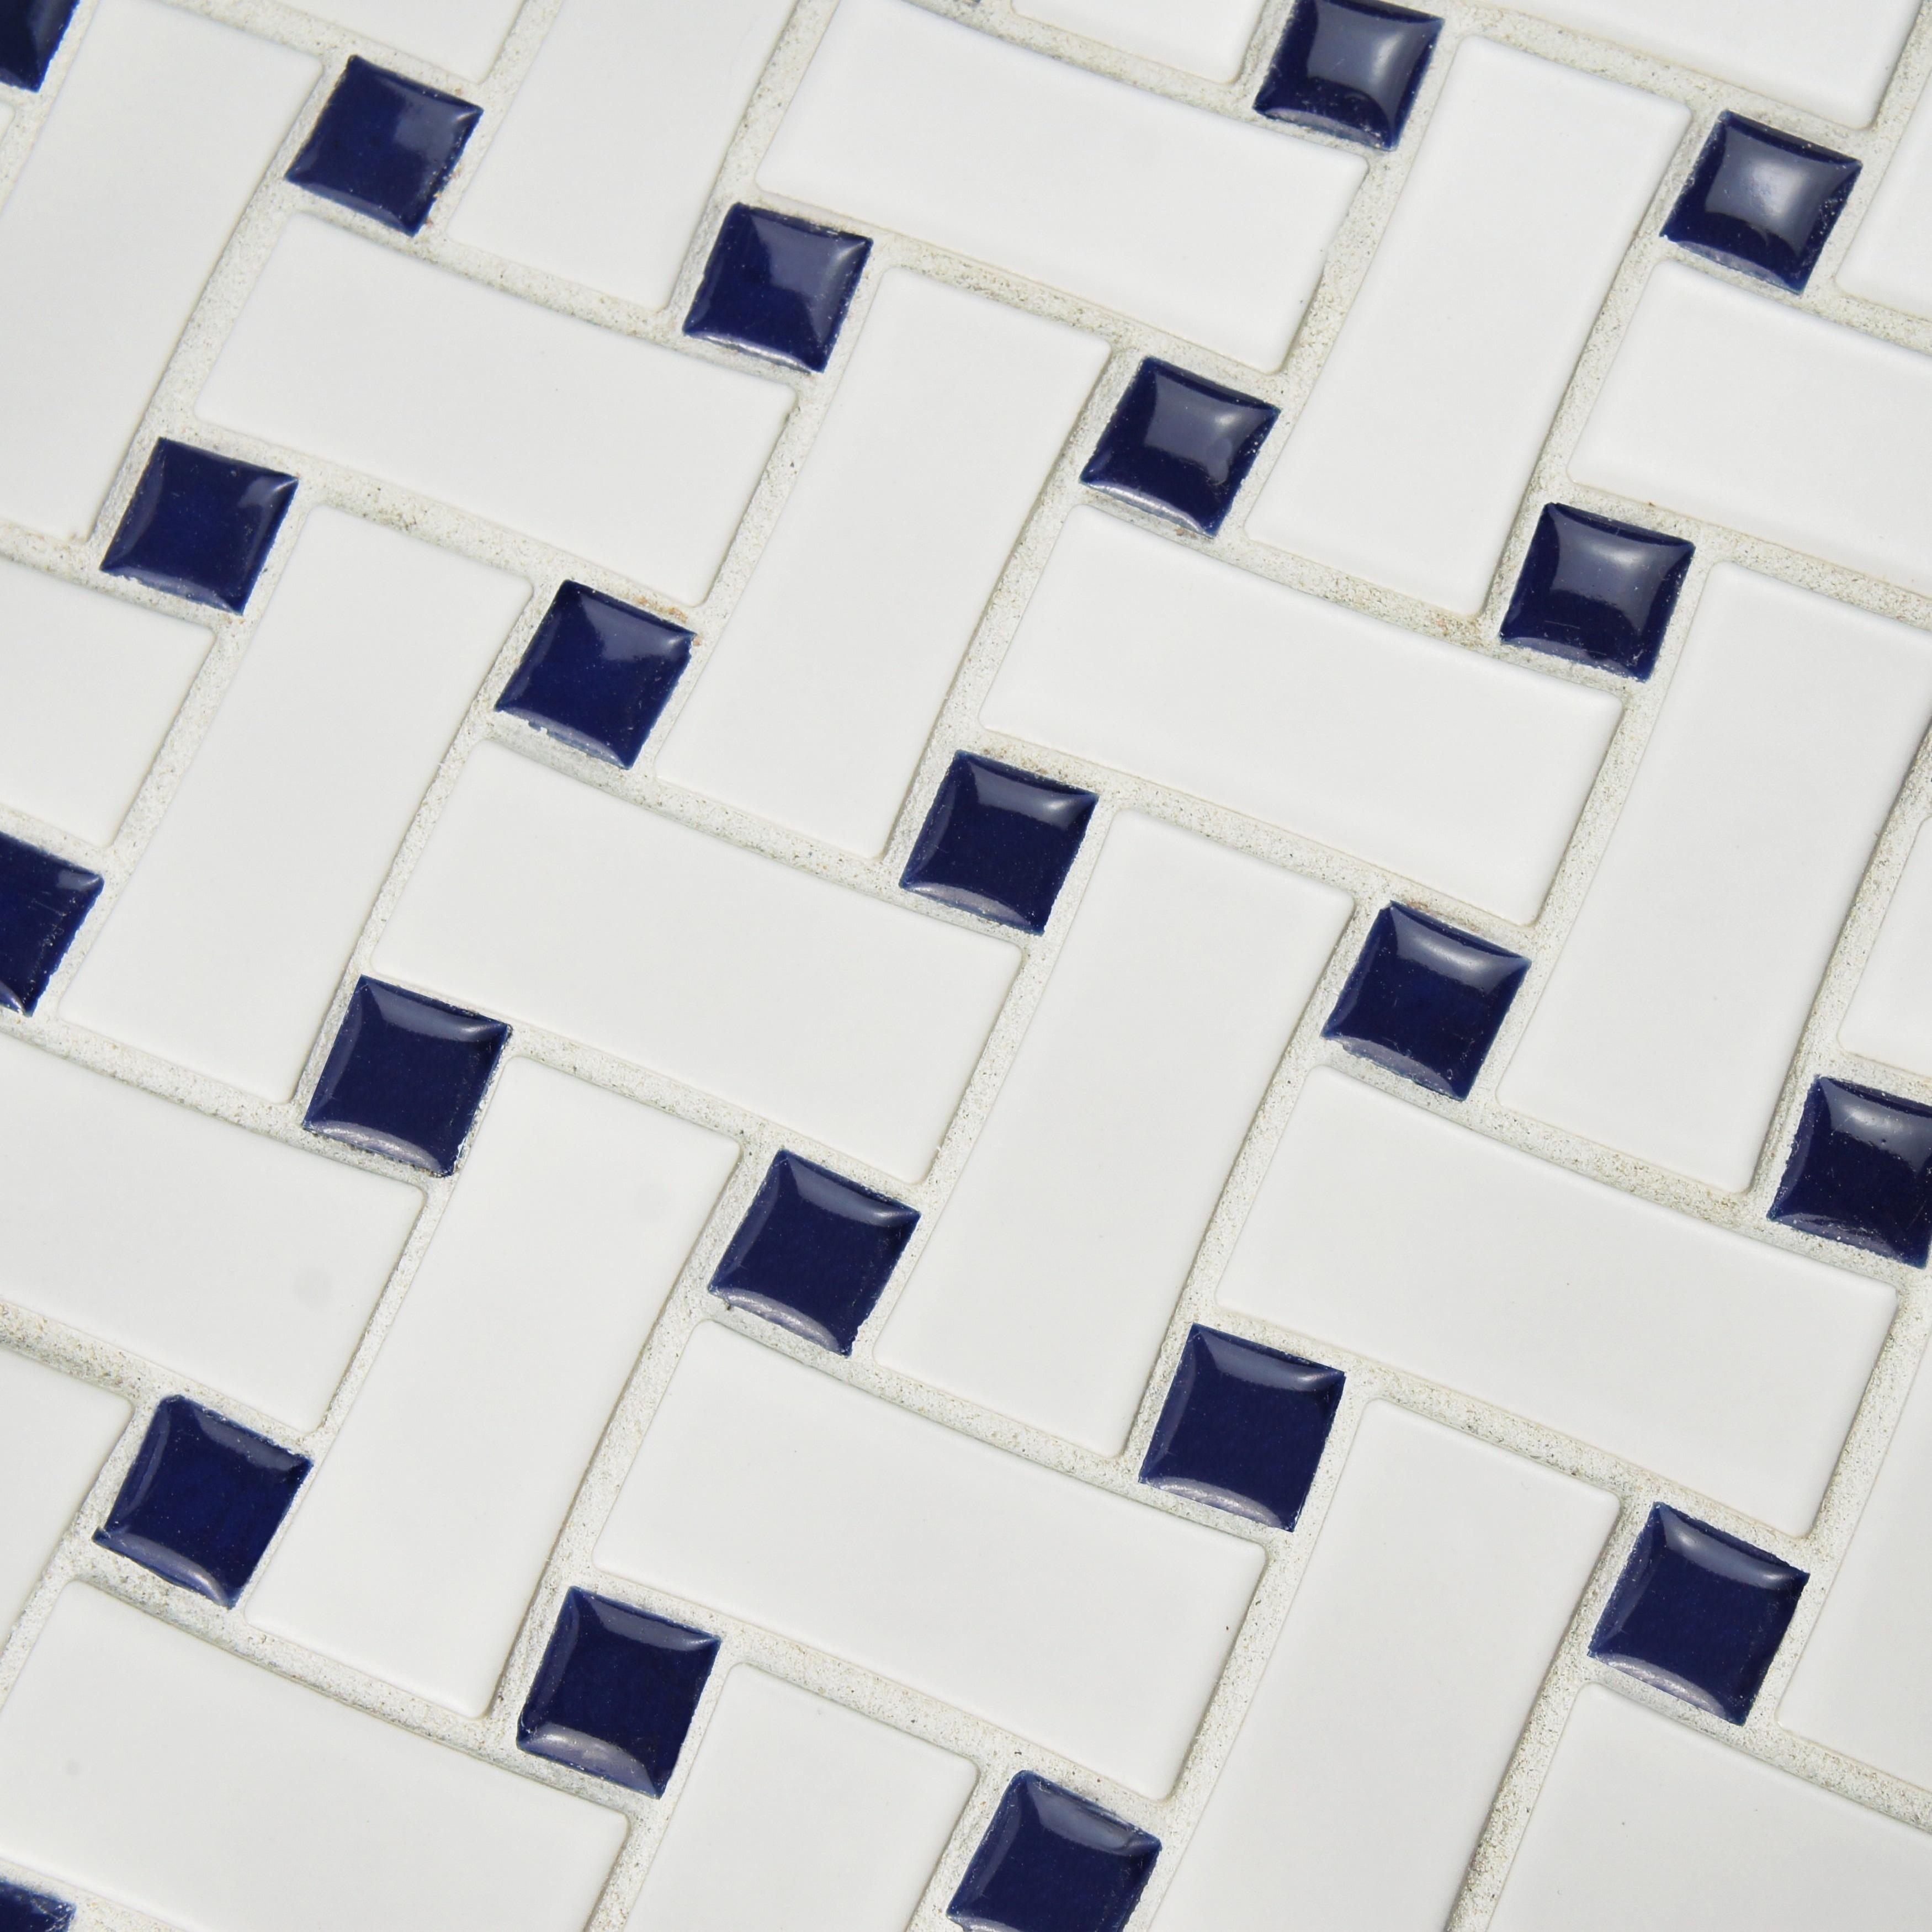 SomerTile 10 5x10 5 inch Victorian Basket Weave White Cobalt